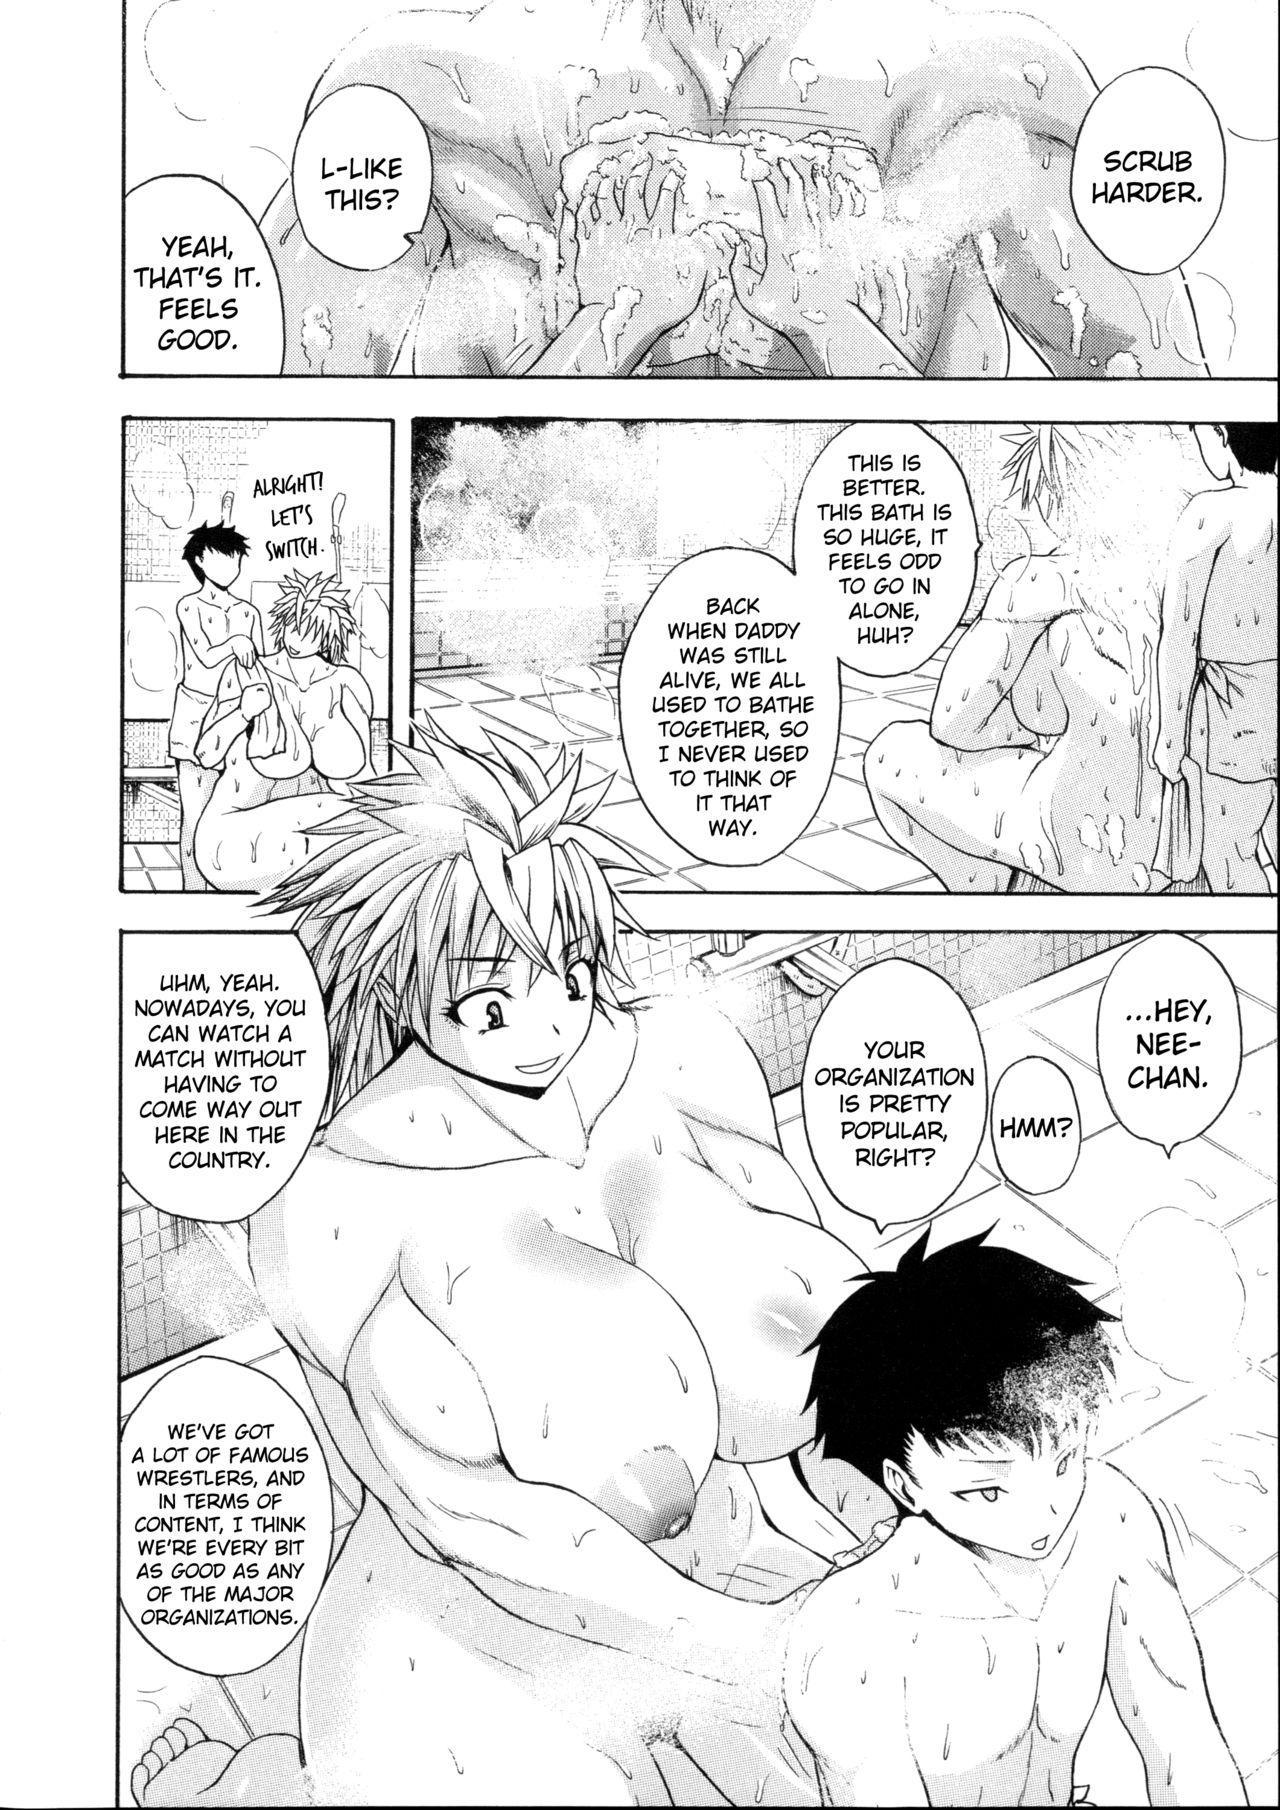 [Yoshimura Tatsumaki] Monzetsu Taigatame ~Count 3 de Ikasete Ageru~ | Faint in Agony Bodylock ~I'll make you cum on the count of 3~ [English] [Brolen] 136